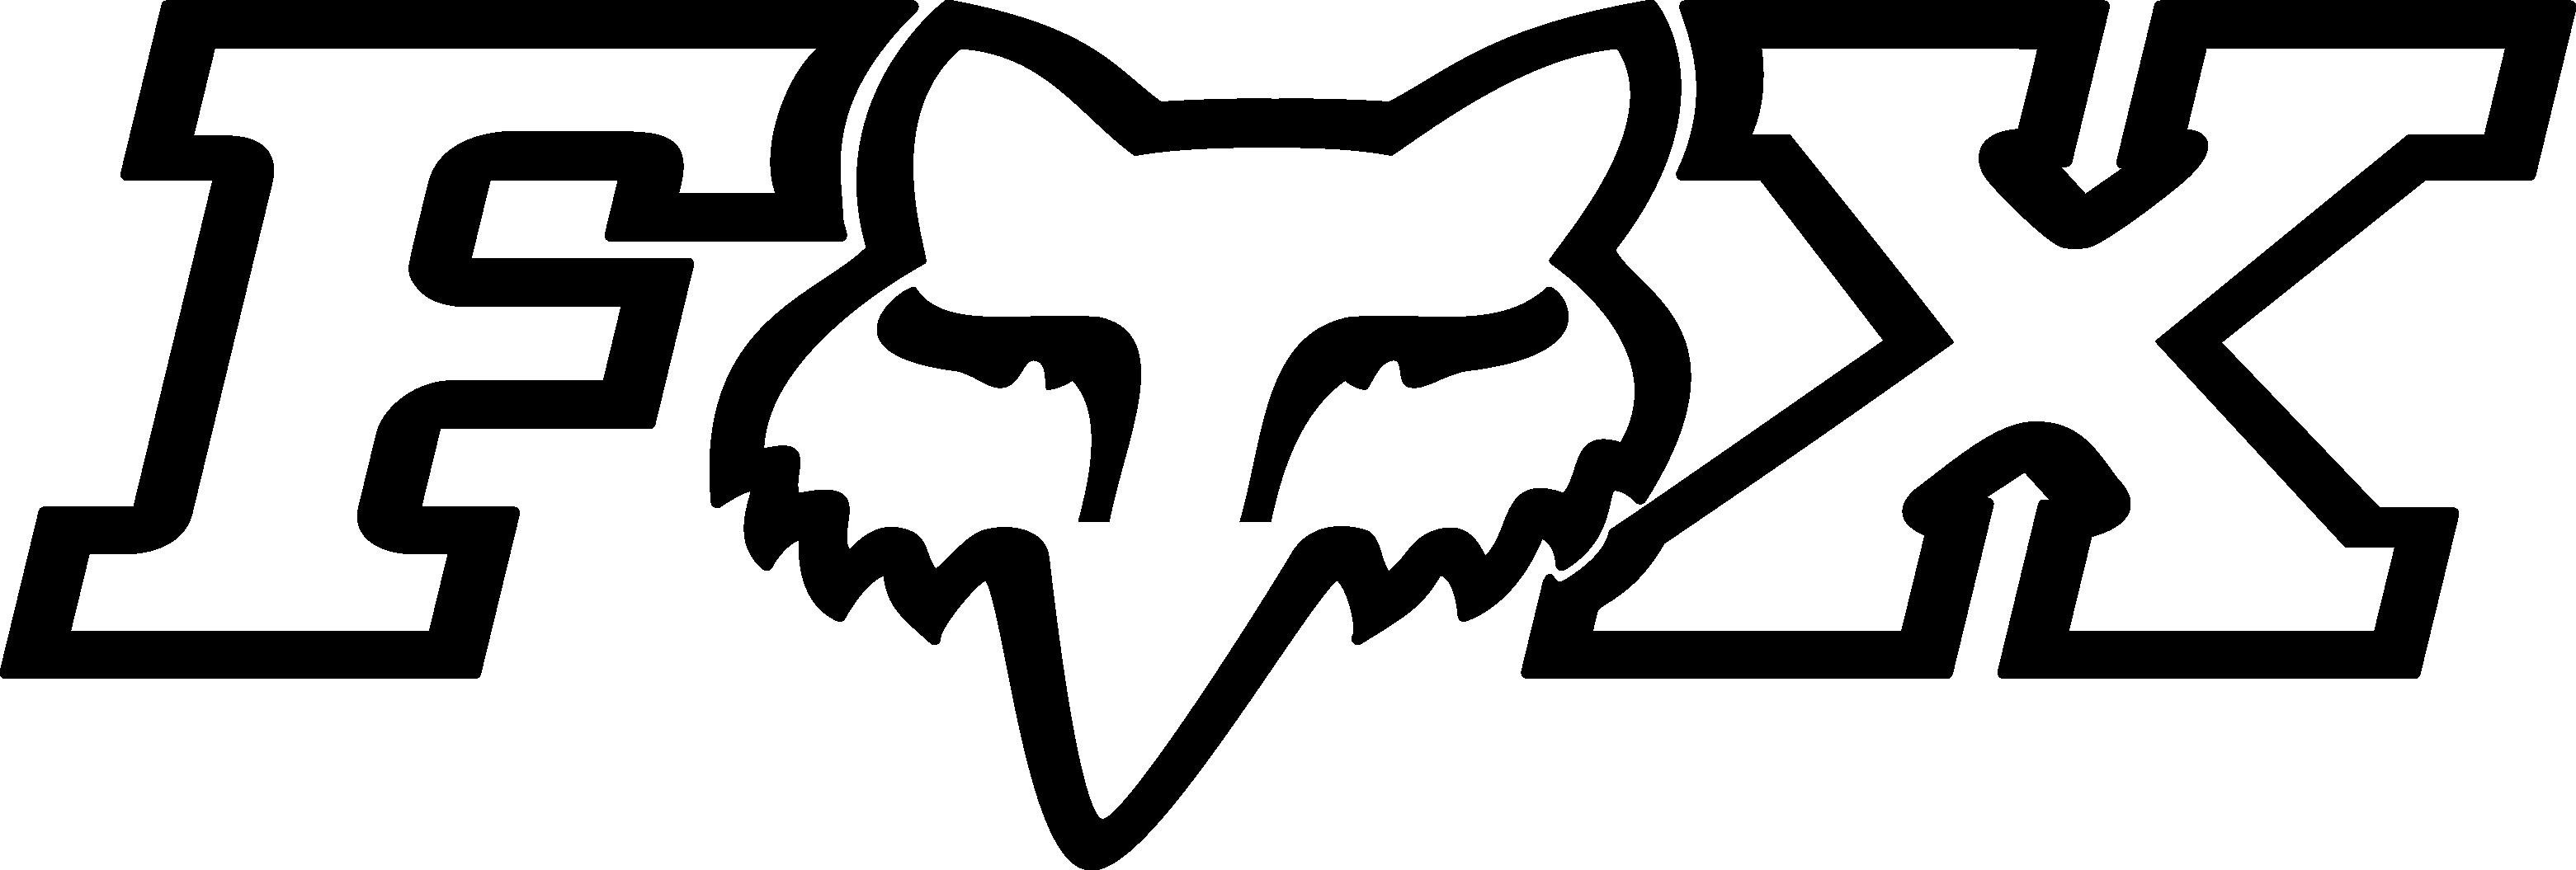 Racing logo clipart vector library Fox Racing Logo Vector EPS Free Download, Logo, Icons, Clipart ... vector library